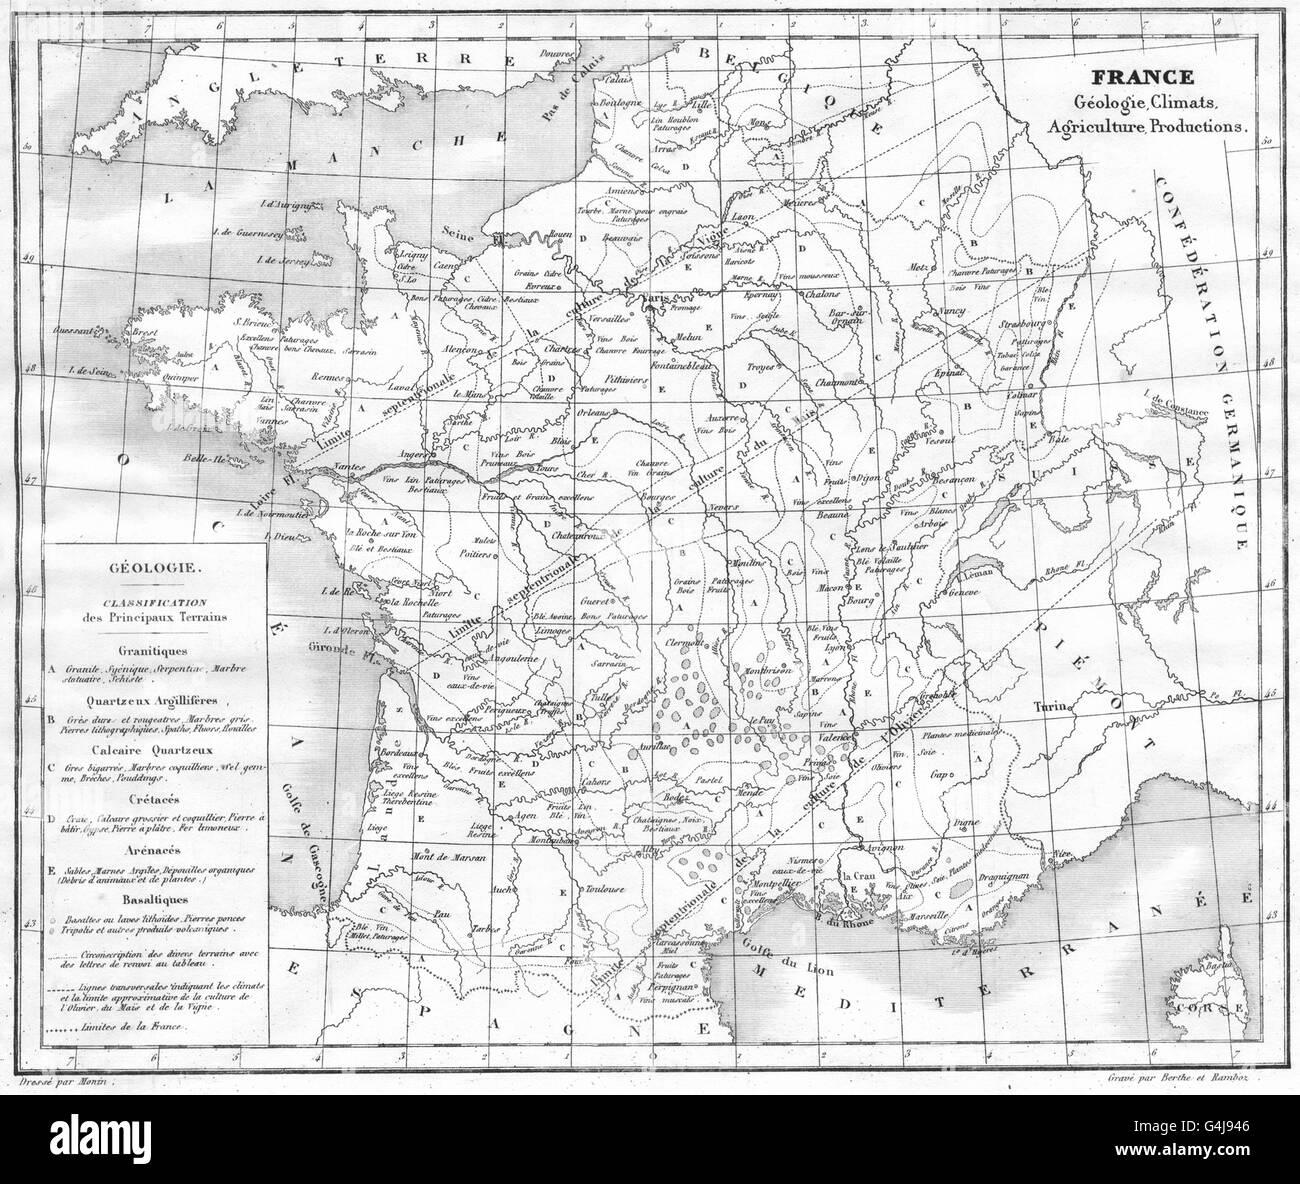 FRANCE: France Géologie, climats, Agriculture productions, 1835 antique map - Stock Image